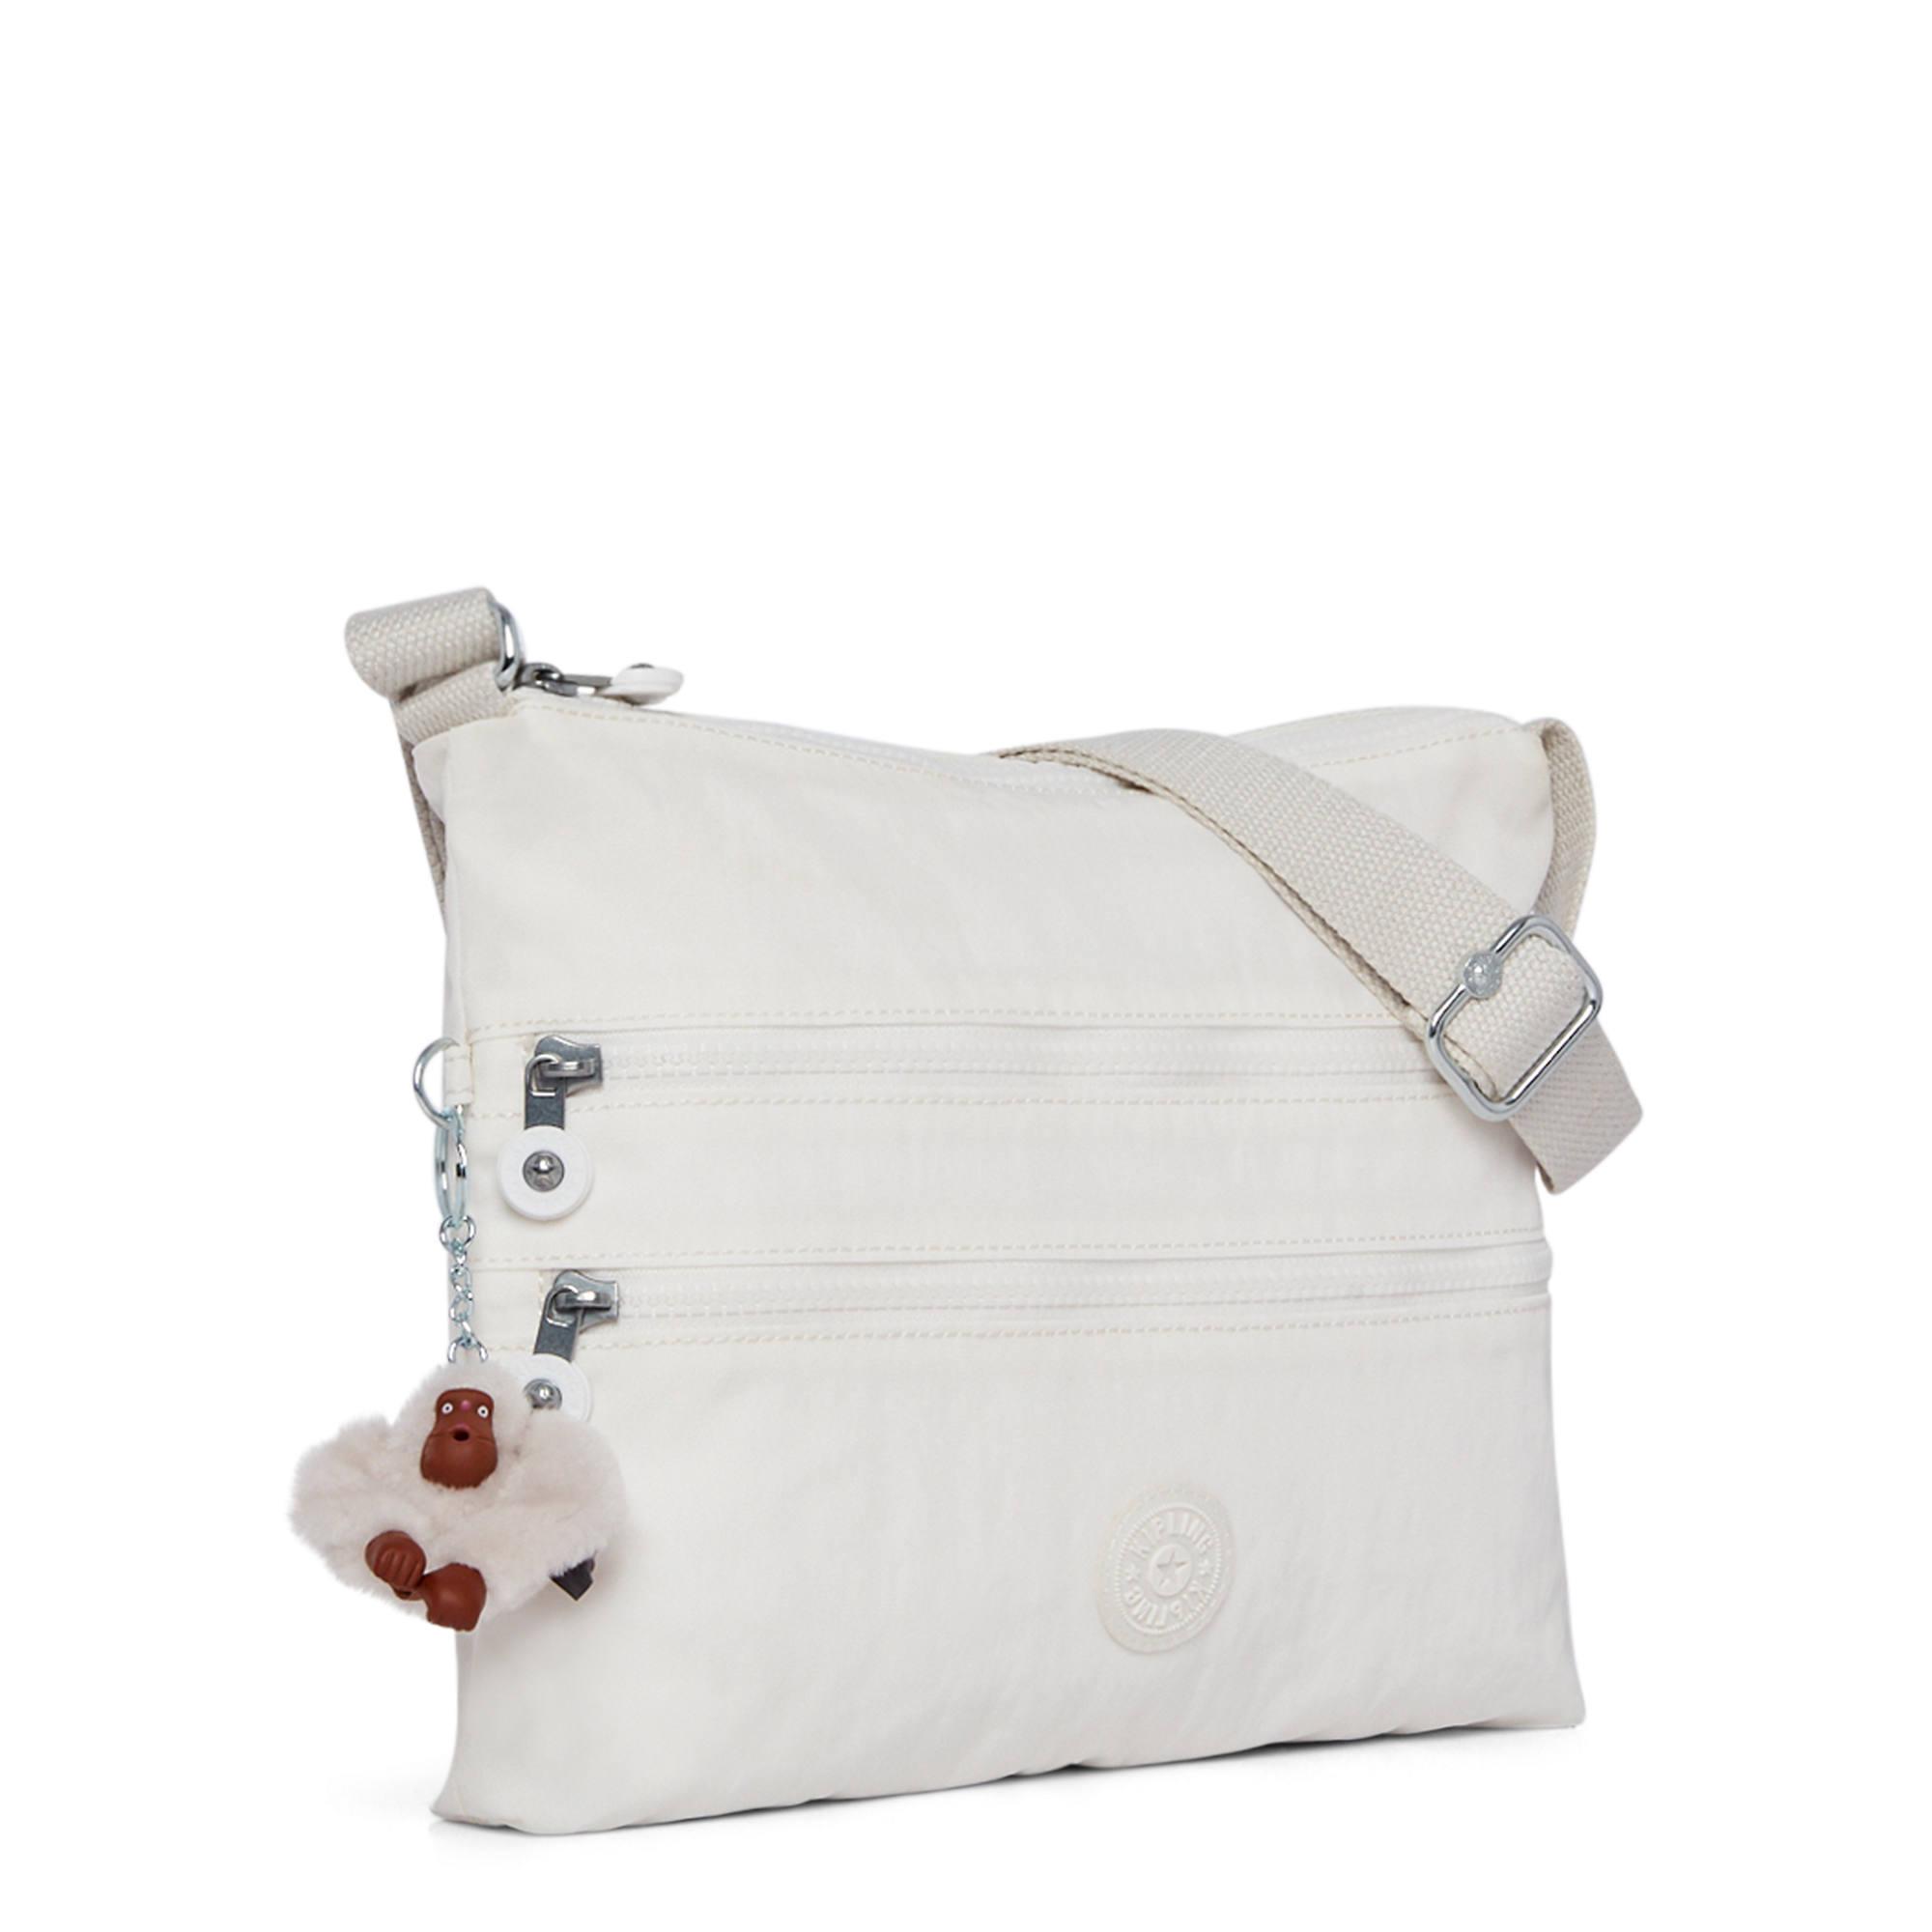 Kipling-Alvar-Metallic-Crossbody-Bag miniature 5